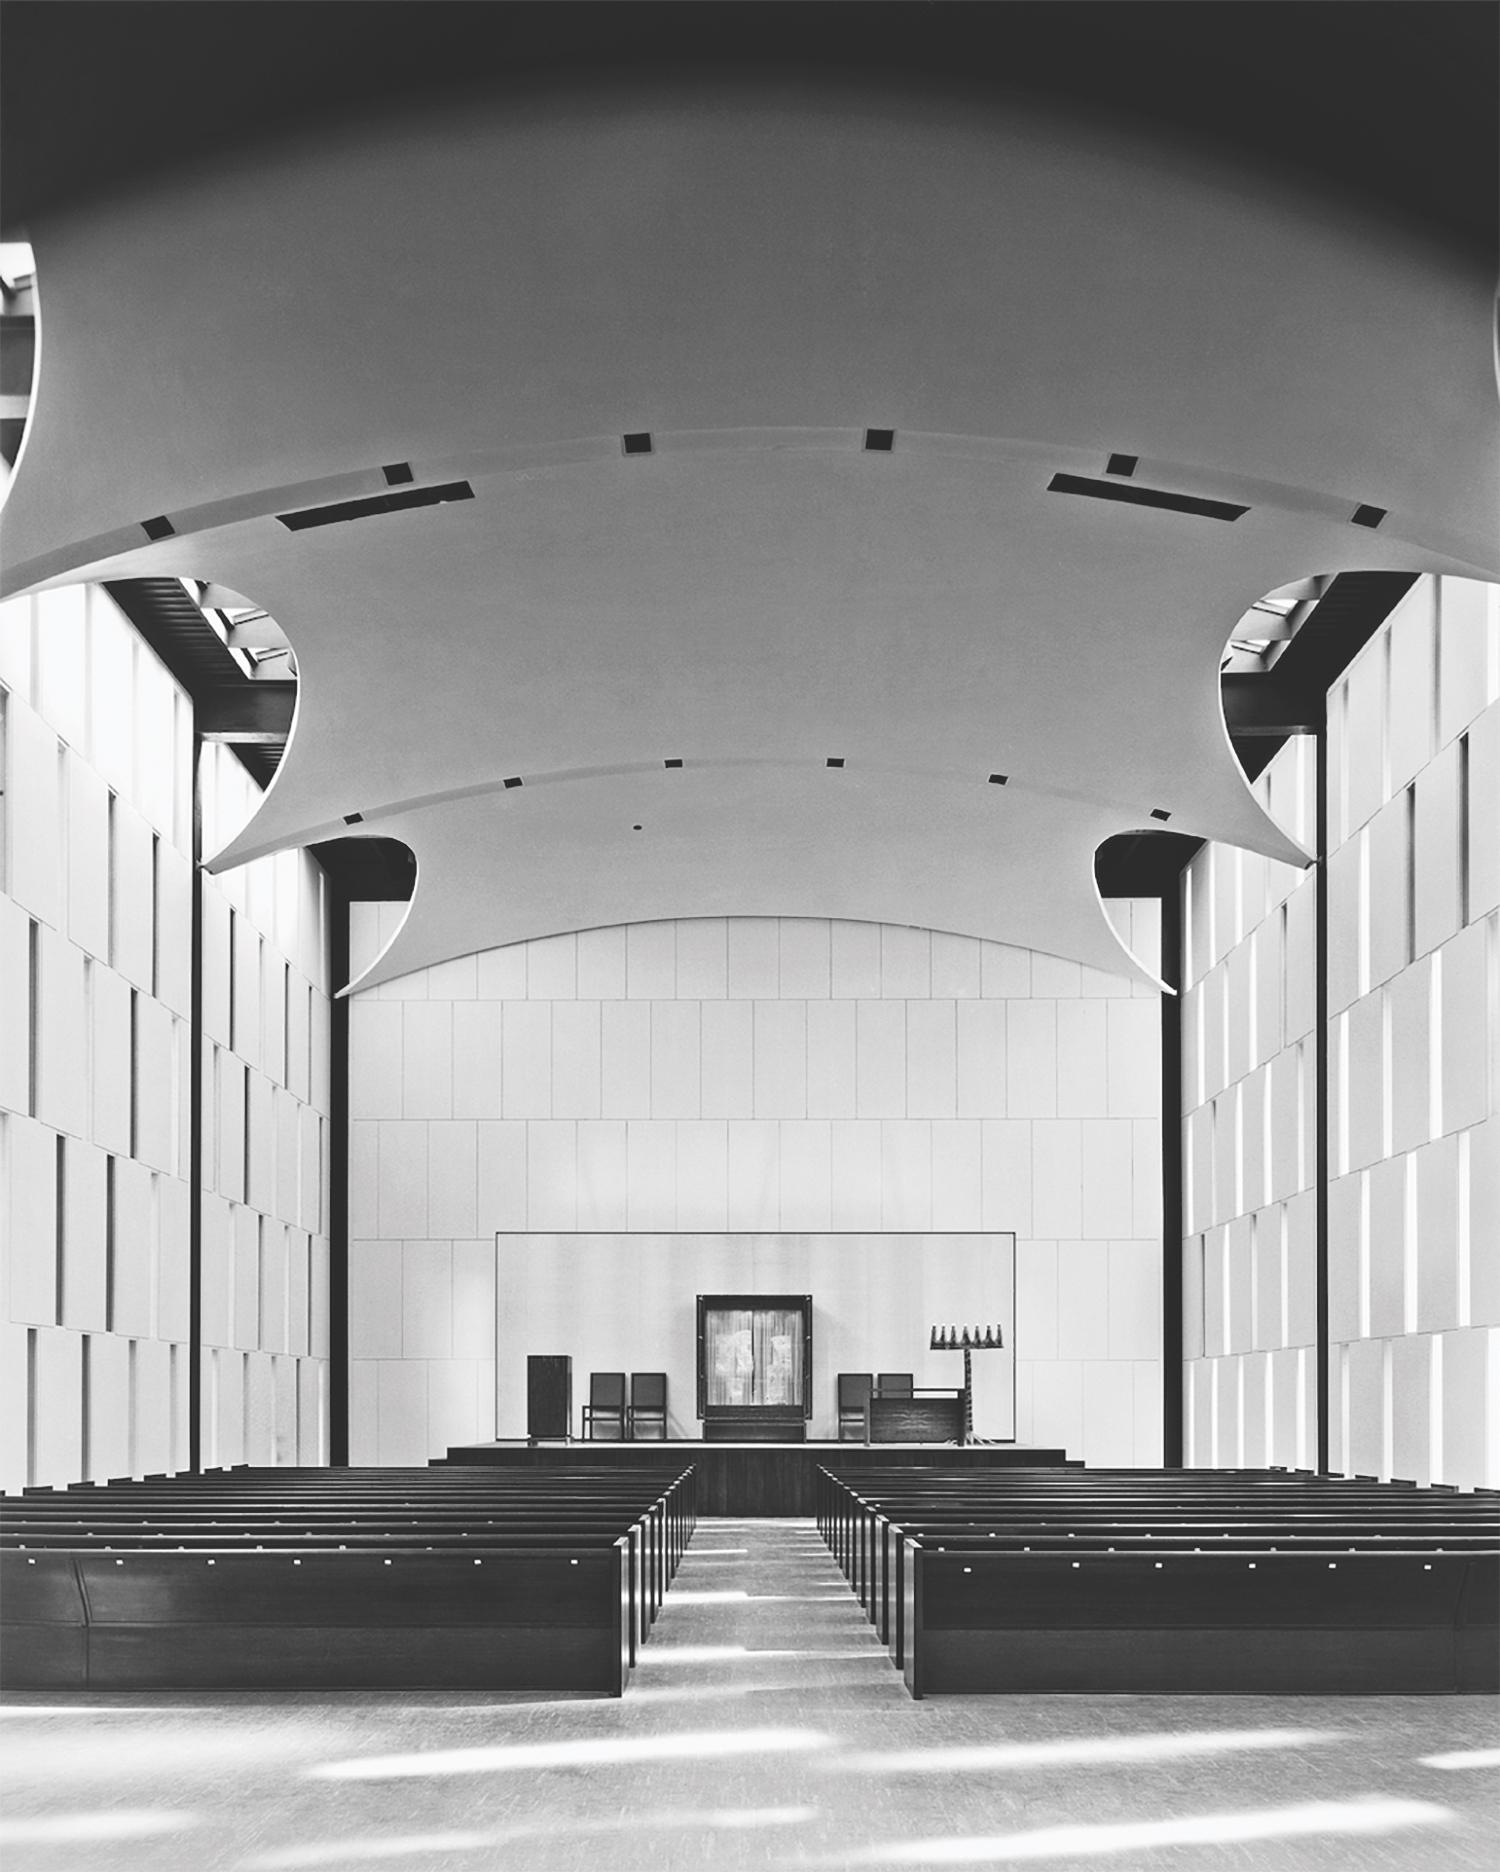 Johnson's atonement Congregations Kneses Tifereth Israel of 1956 (Esto-Ezra Stoller)